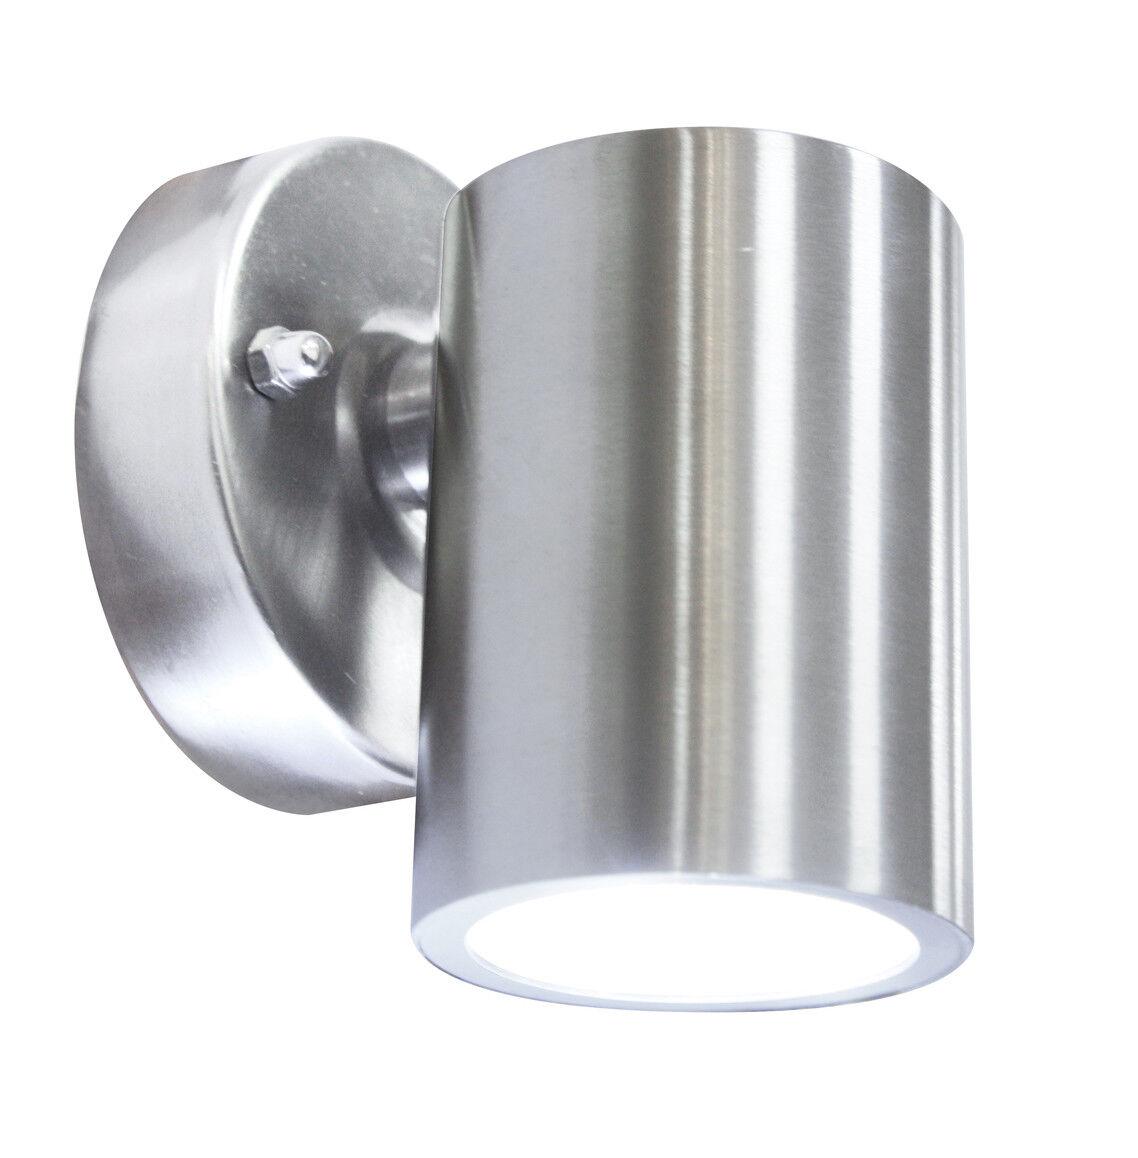 9 X 316 Acero Inoxidable LED de luces de parojo fijo exterior al aire libre 240 V 3 W blancoo Cálido